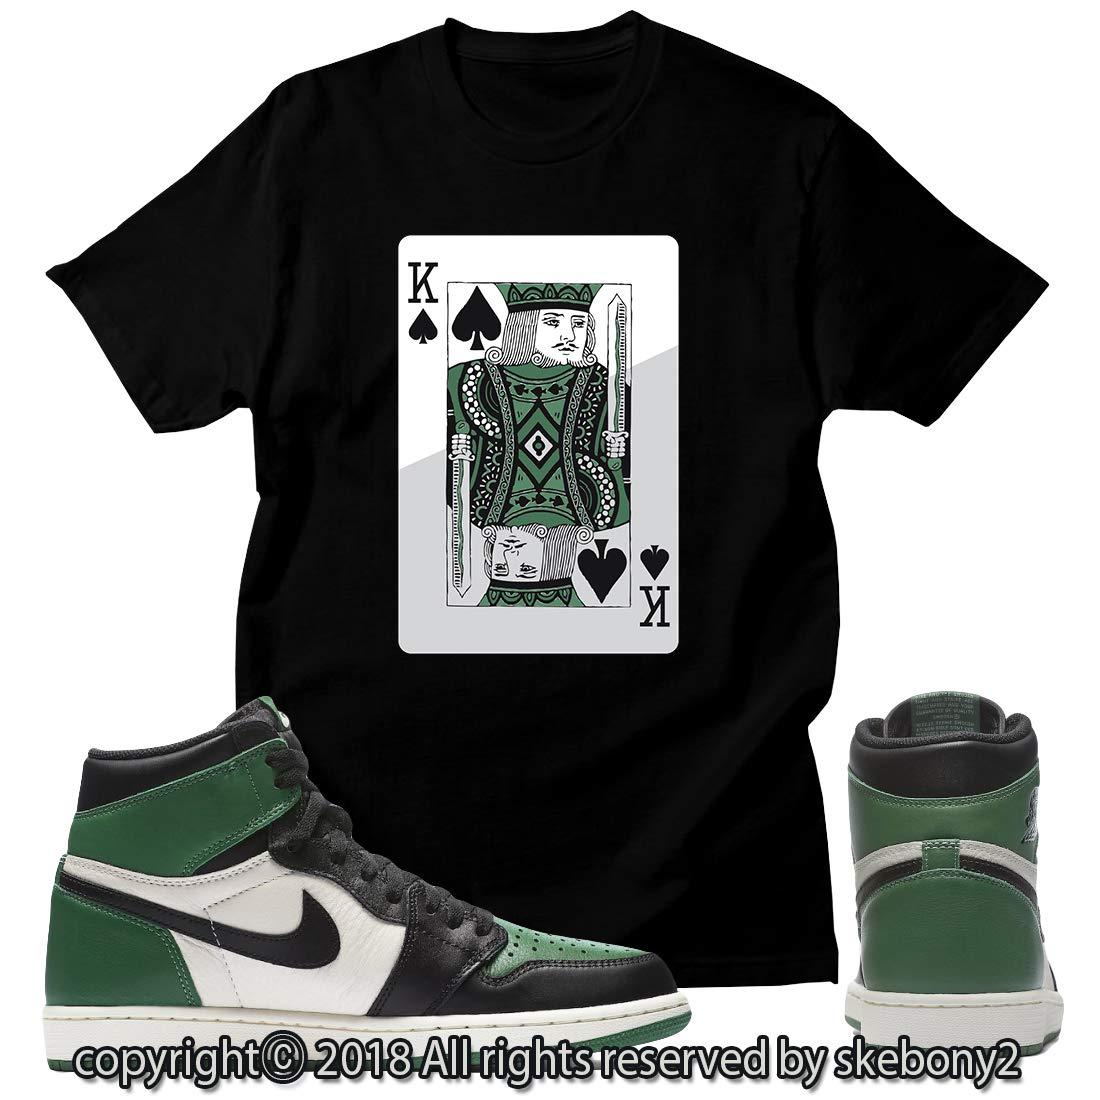 3480e8554281bb Custom T Shirt Matching Style of Air Jordan 1 Retro High Pine Green JD 1-22-17  at Amazon Men s Clothing store